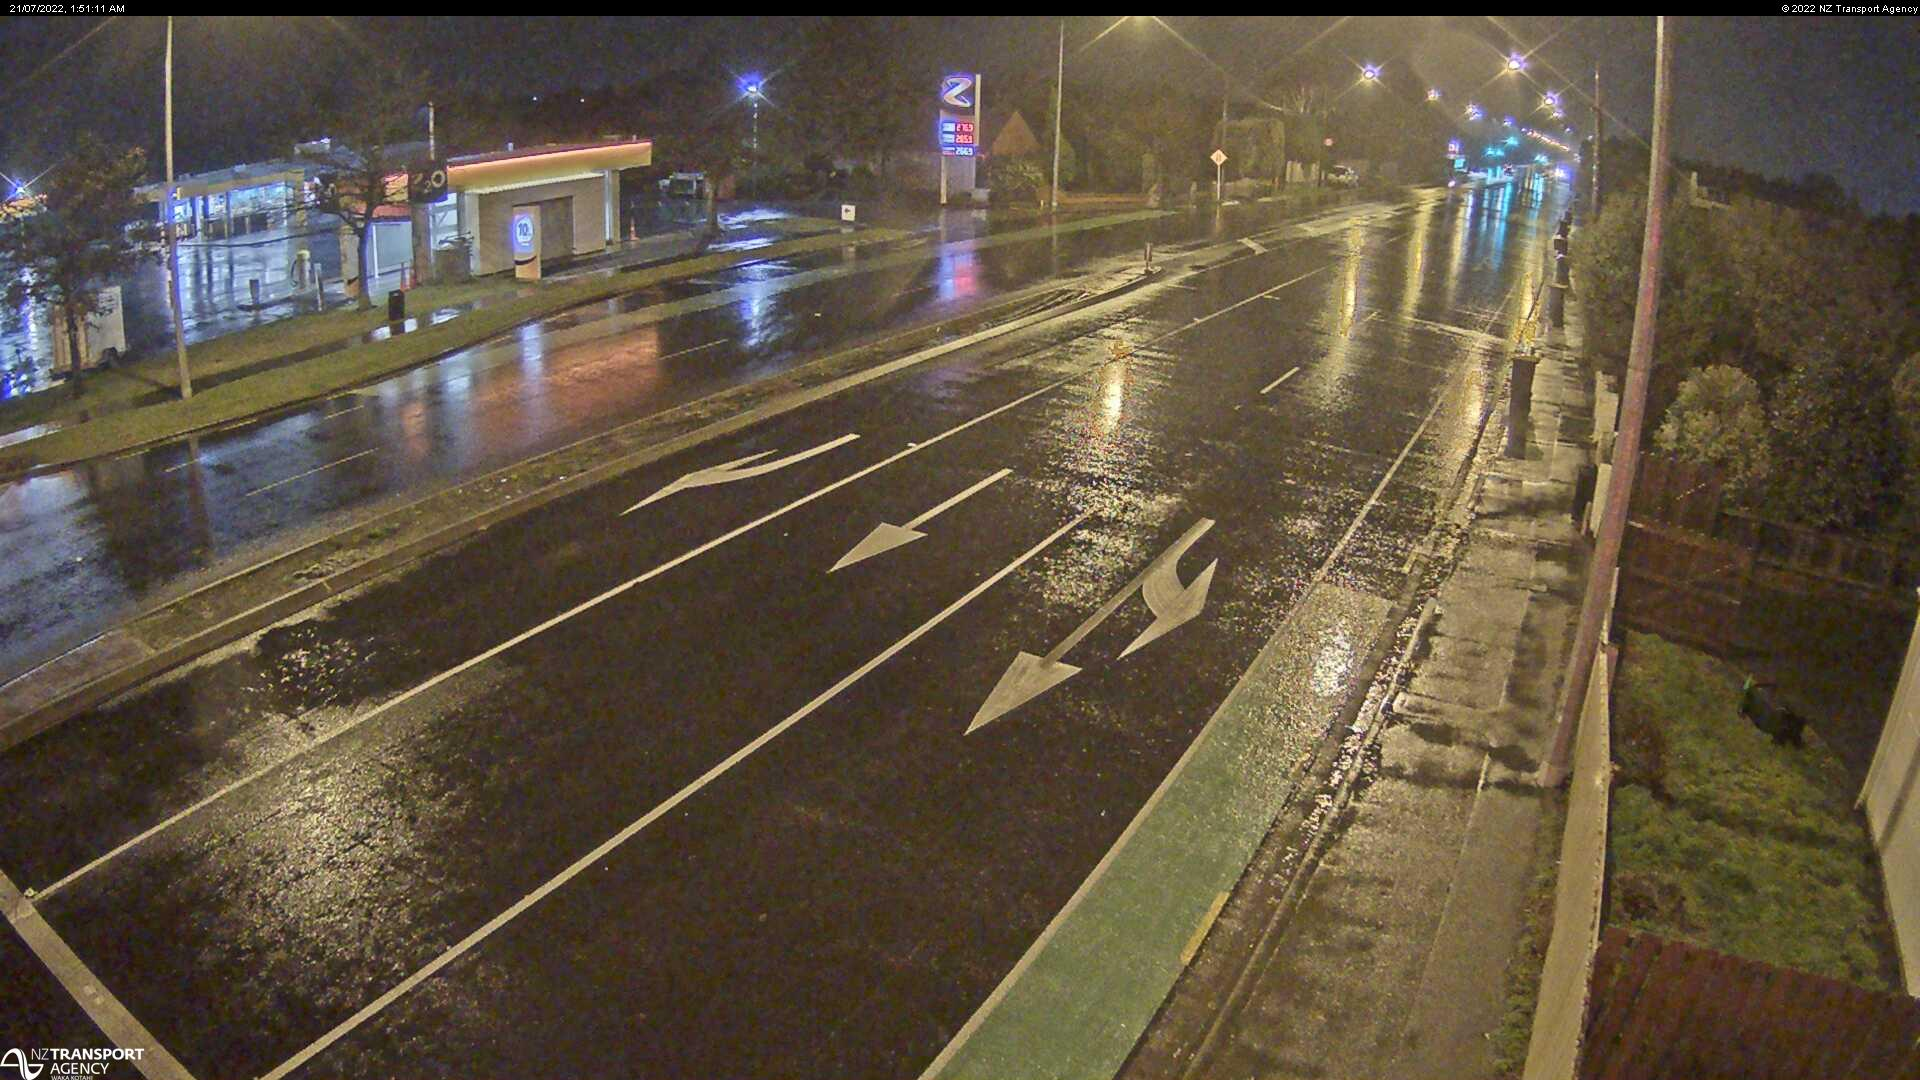 Christchurch Traffic Reports - Christchurch Traffic and Road